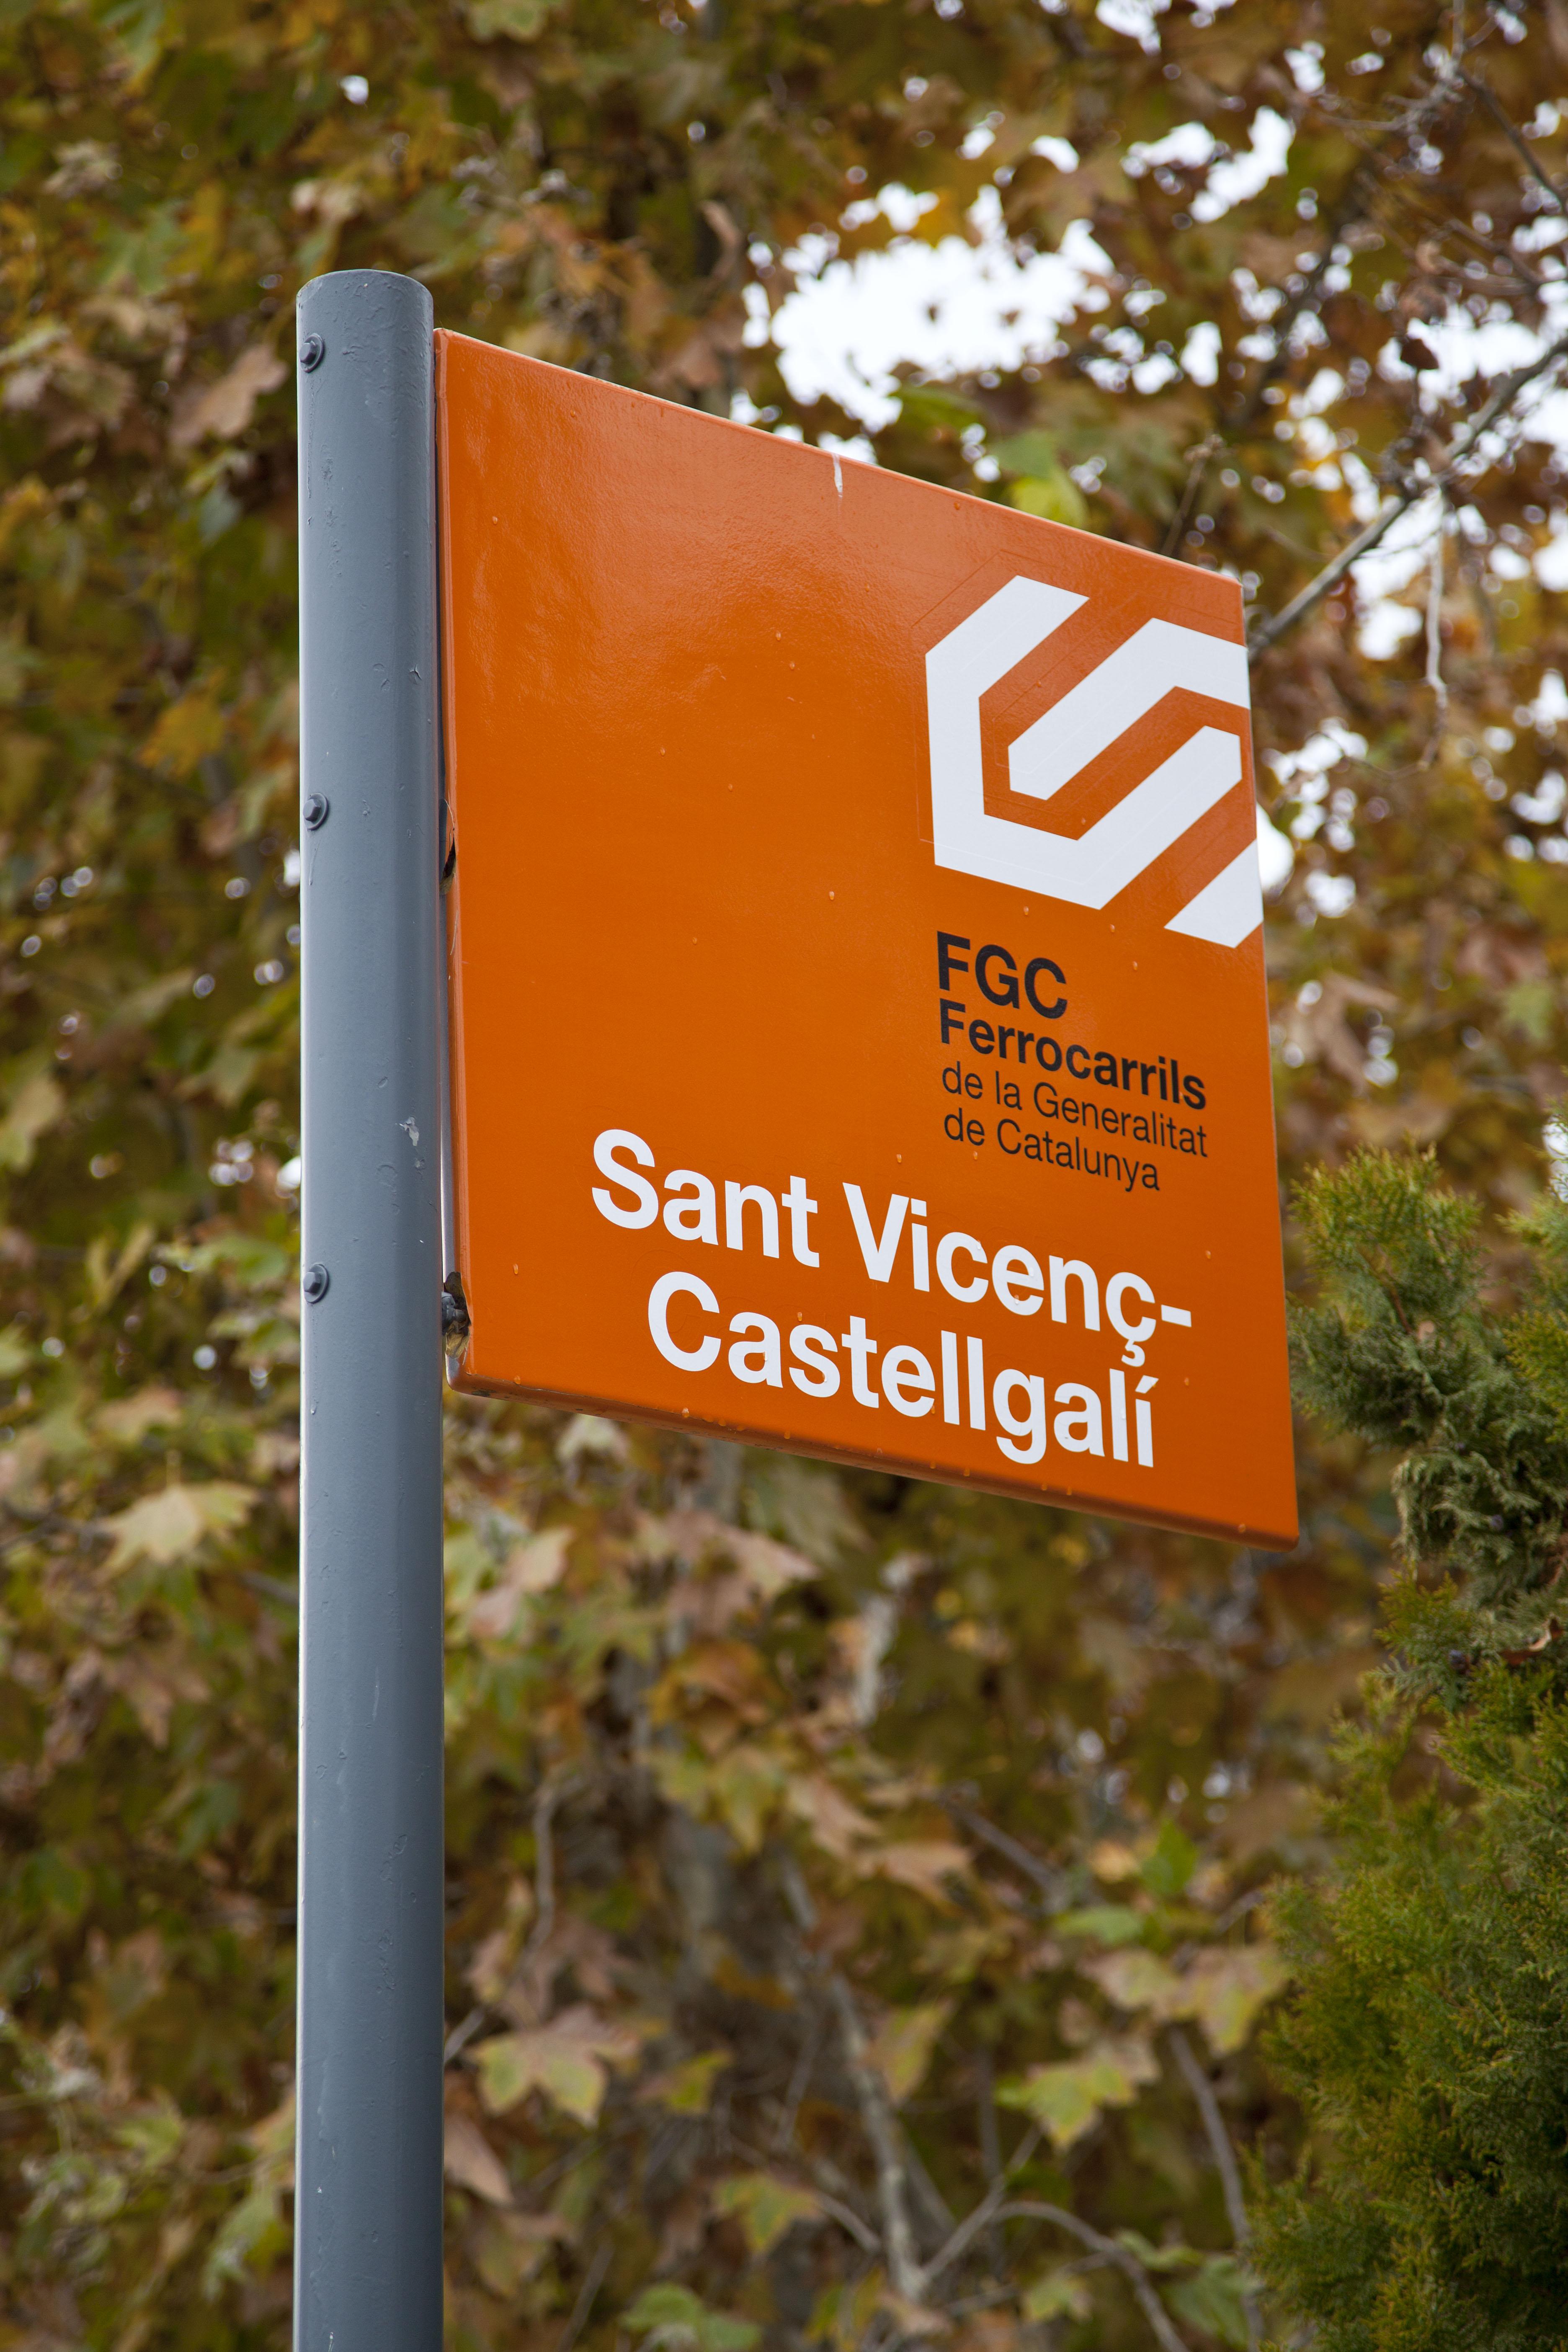 SANT-VICENÇ_CASTELLGALI